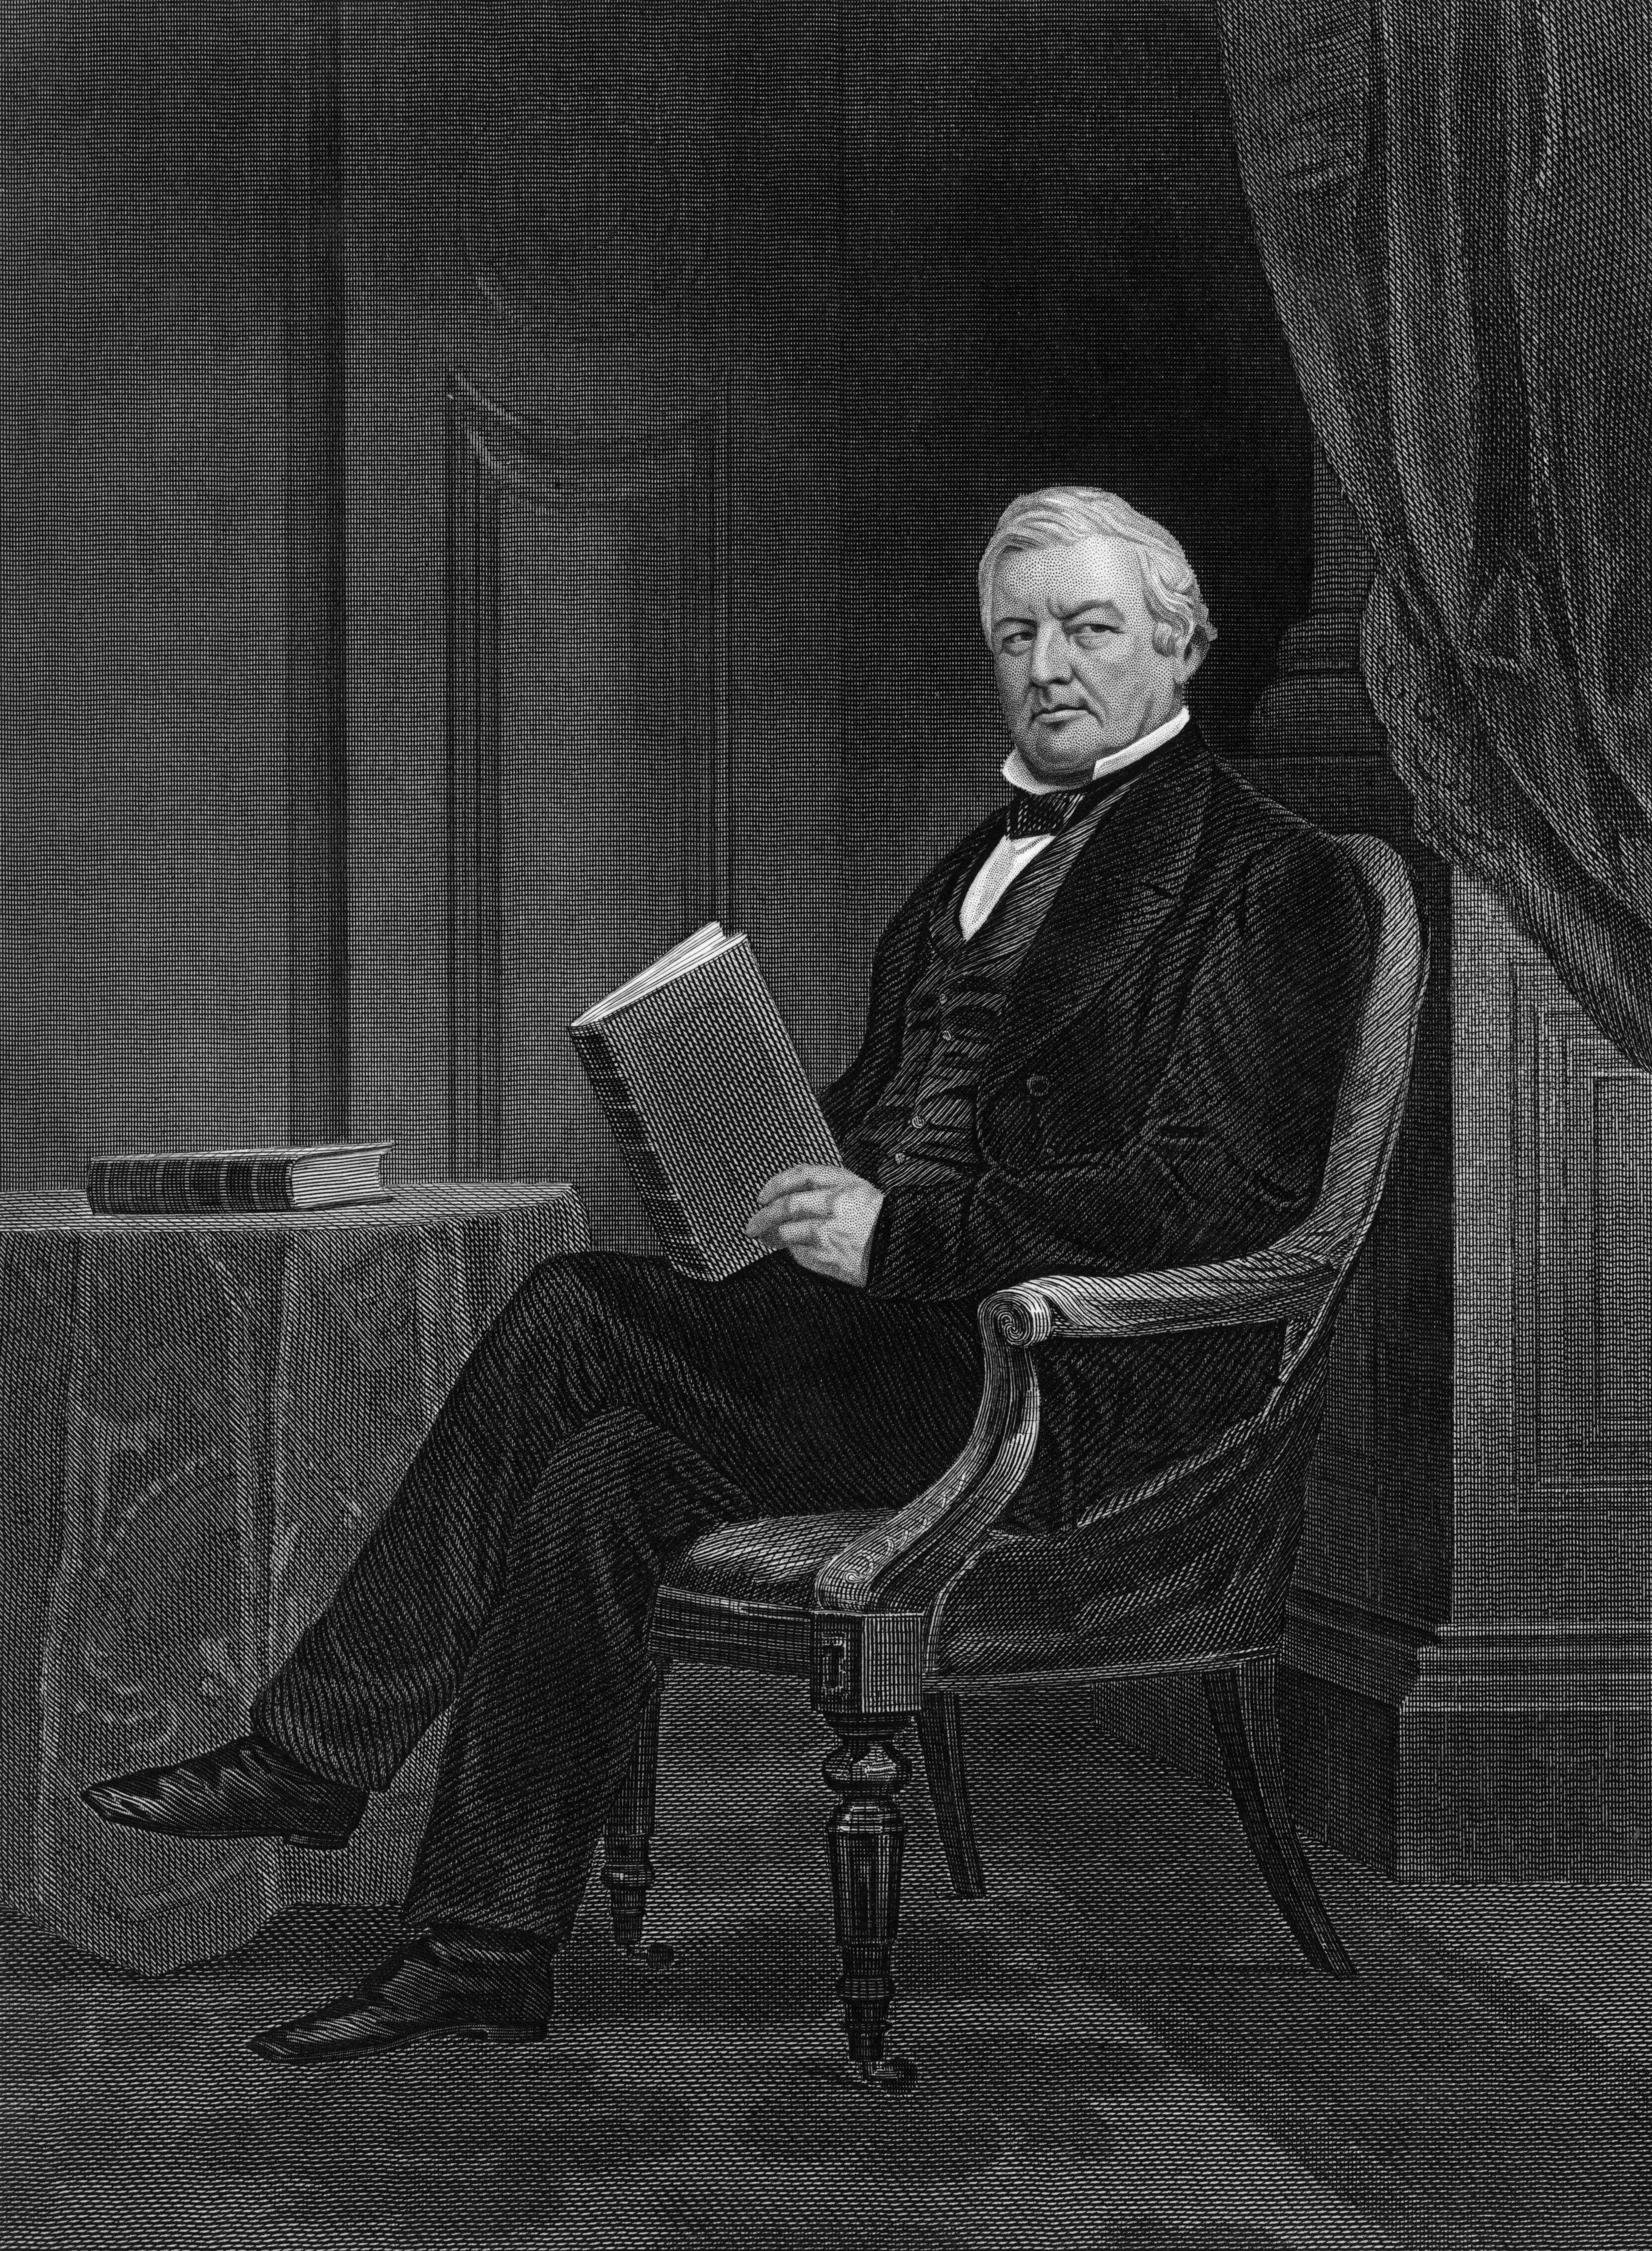 Millard Fillmore sitting with a book